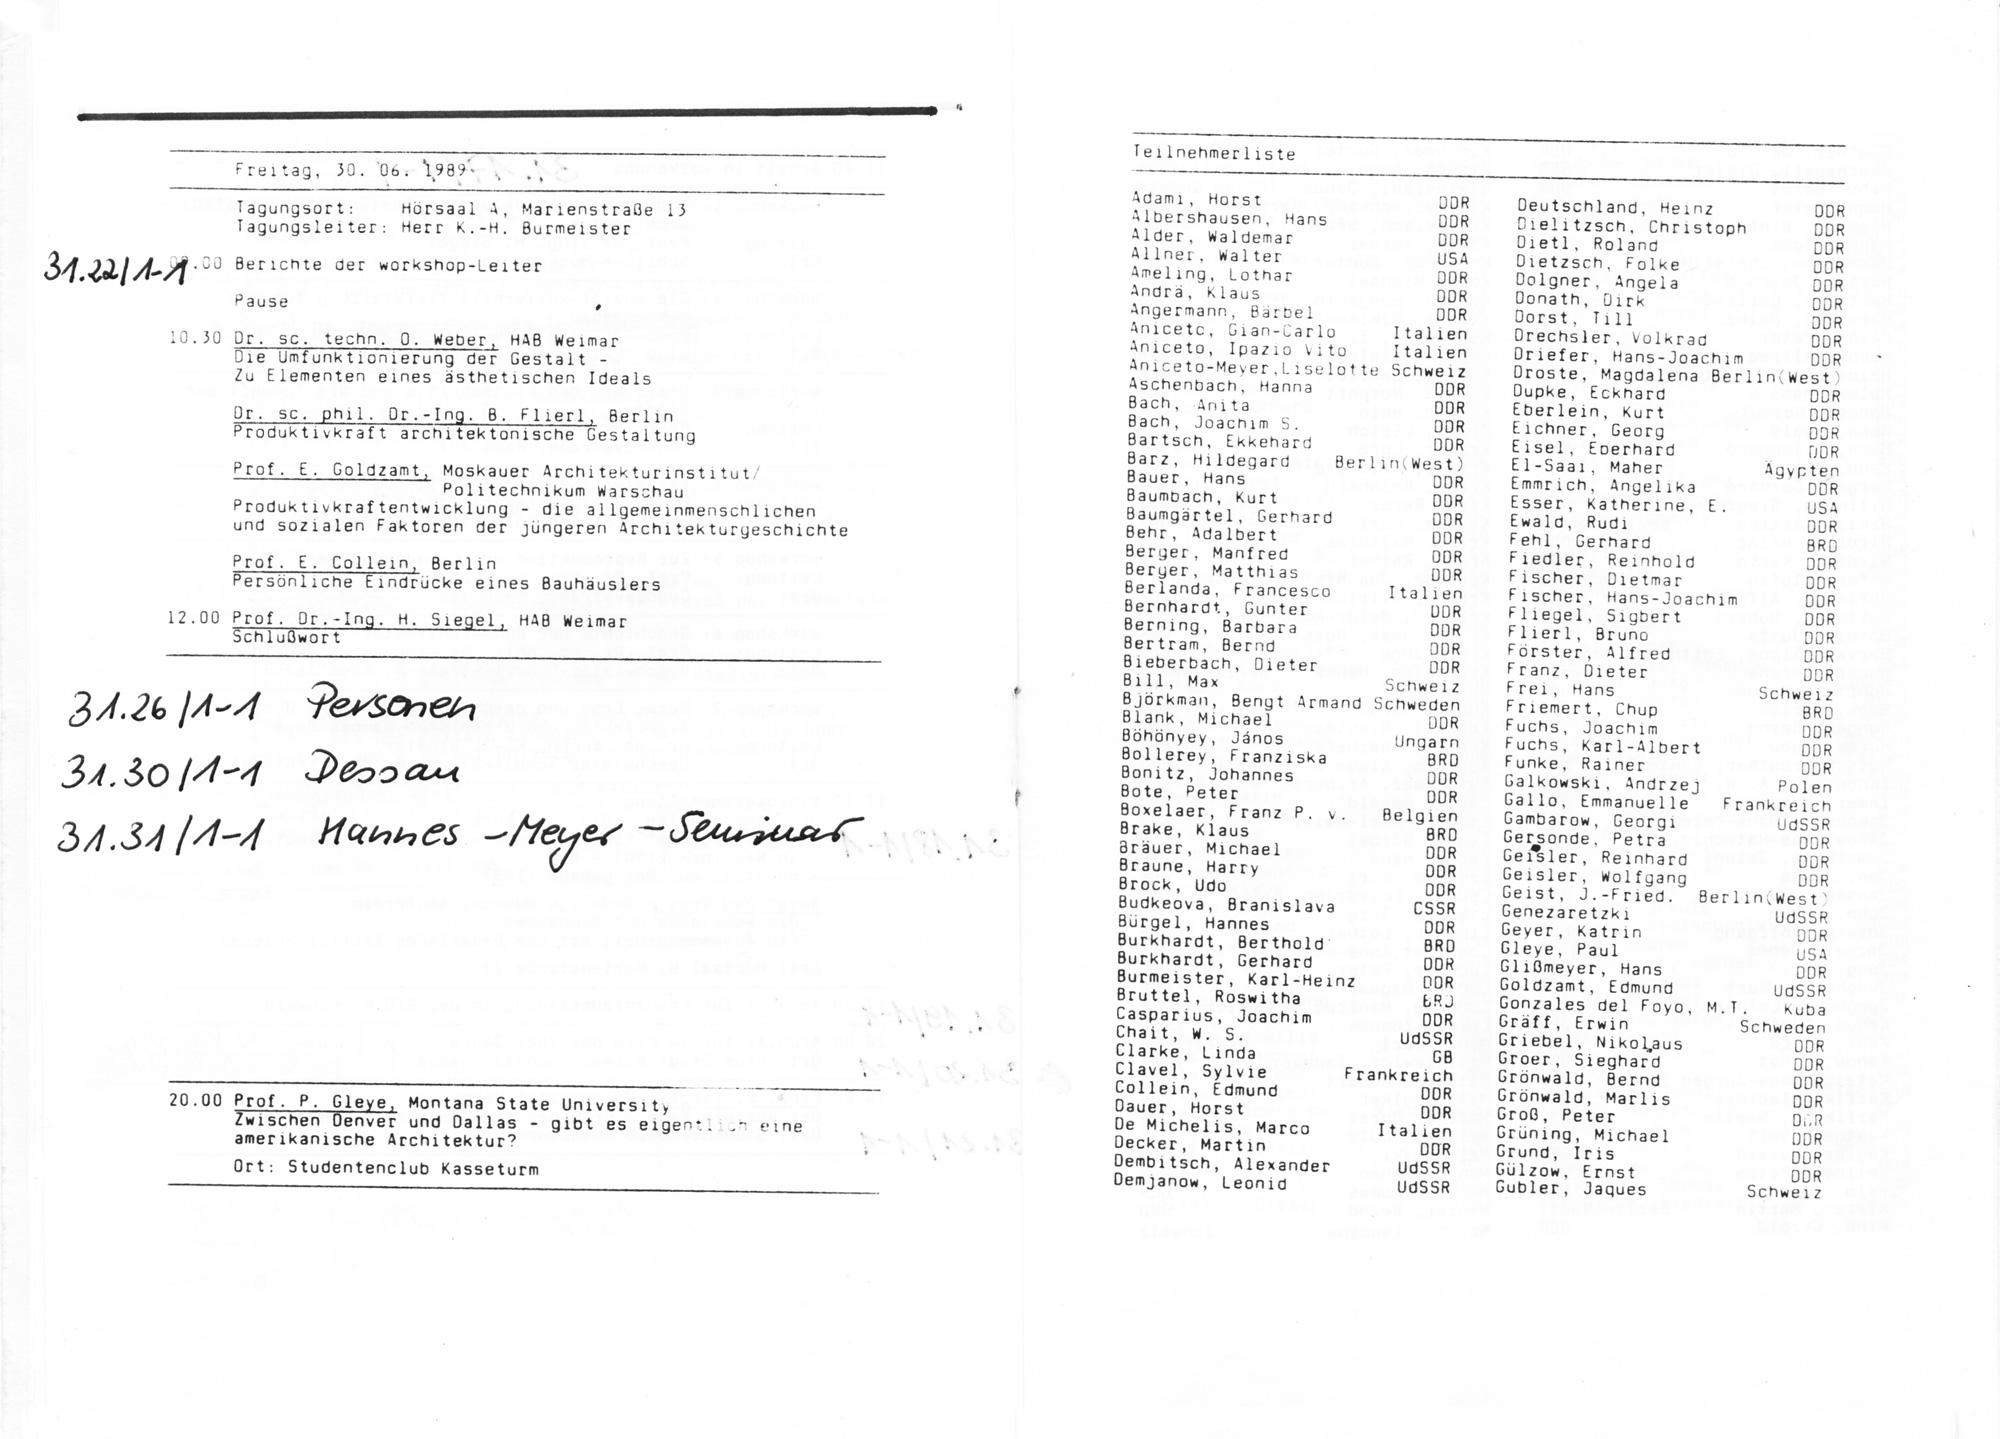 Programm des V. Bauhaus-Kolloquiums